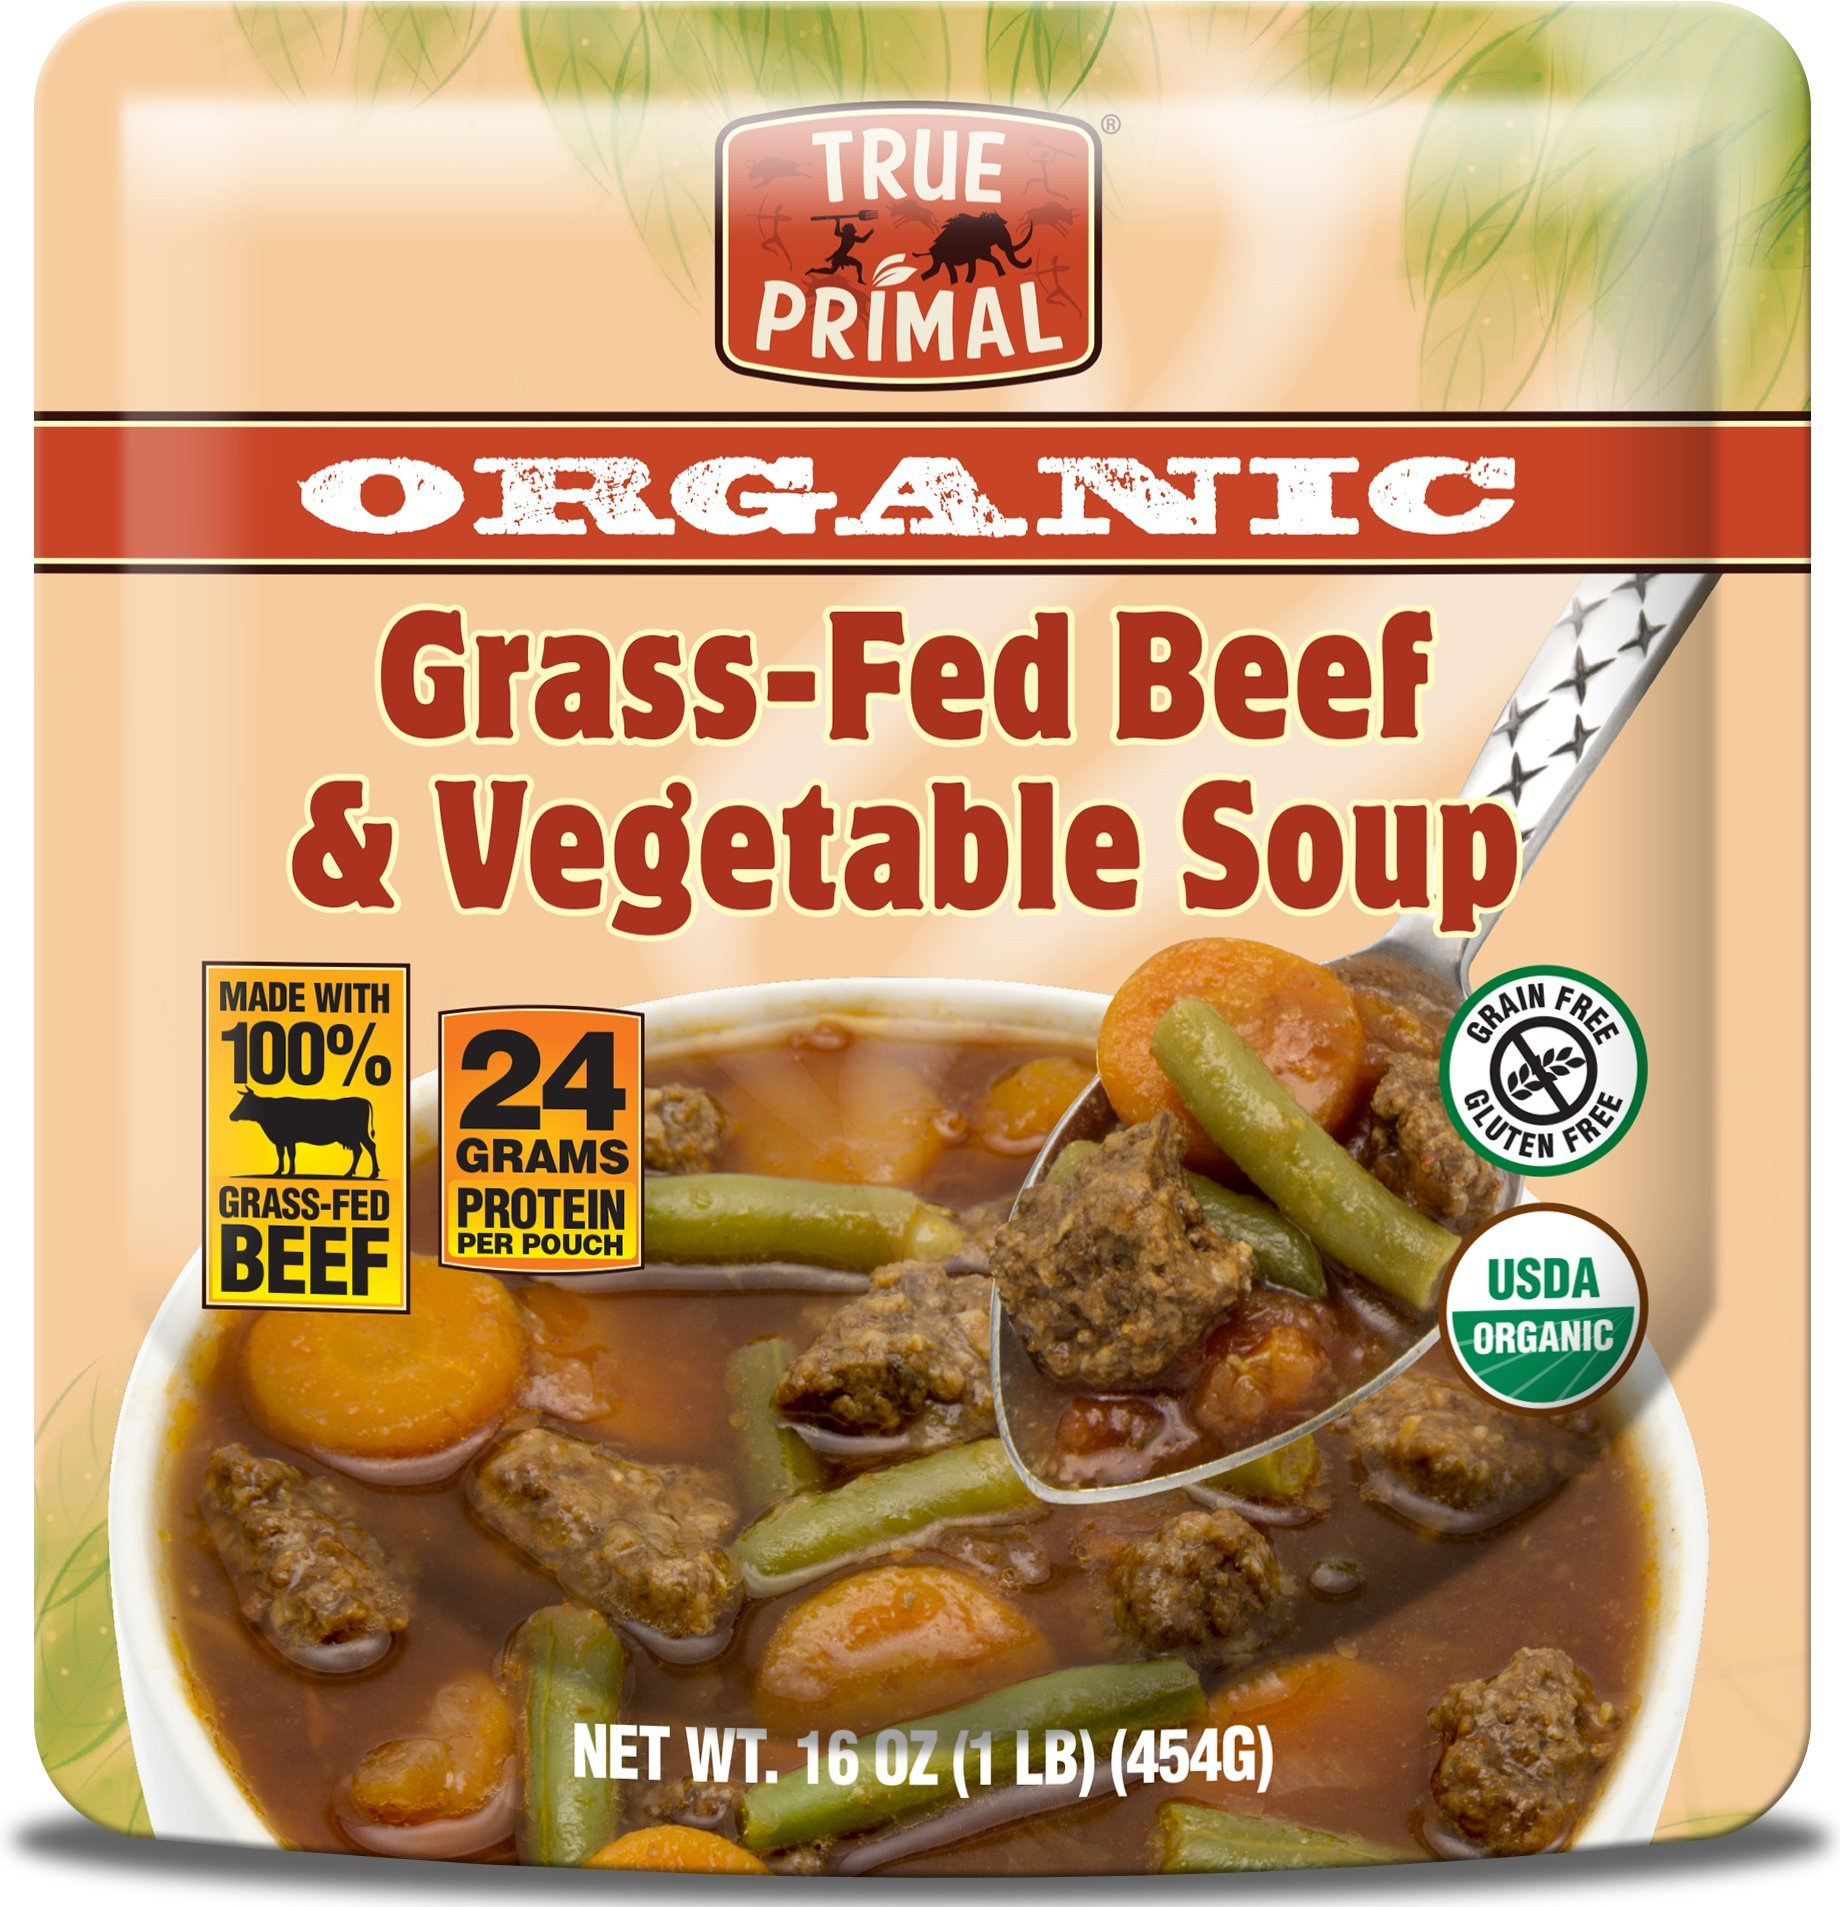 True Primal Organic Grass-Fed Beef & Vegetable Soup (Paleo, Gluten-free, Grain-free, Microwavable) 10-pack by True Primal